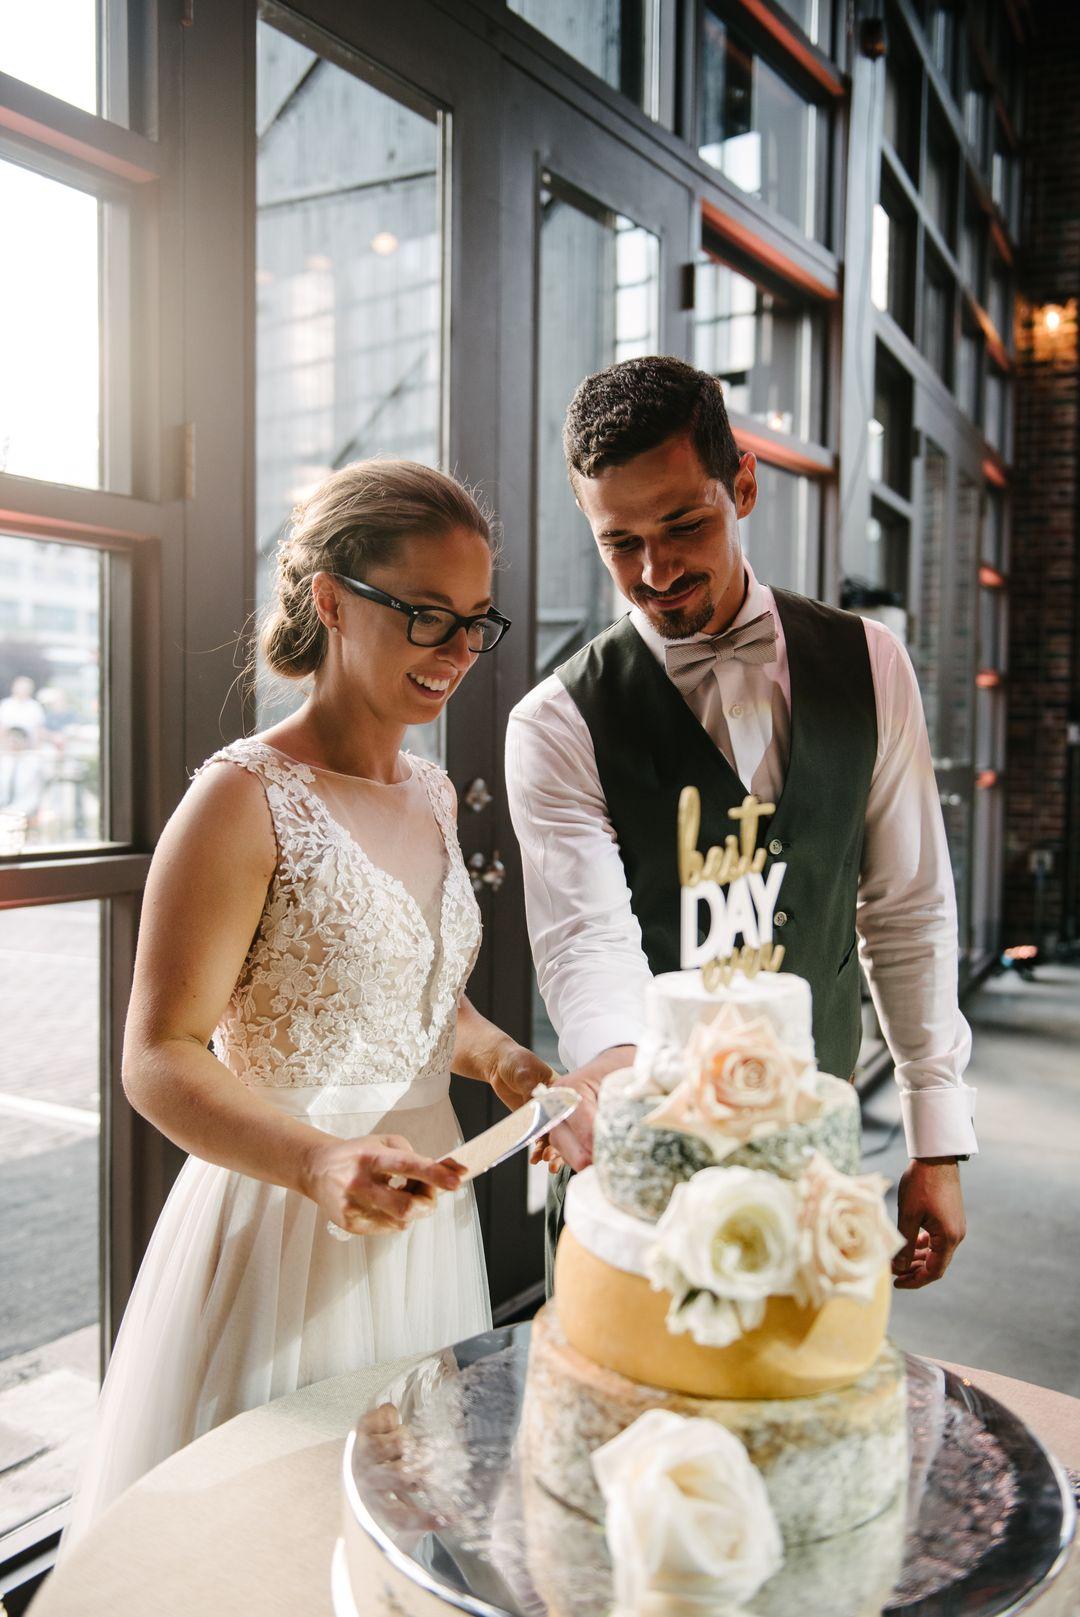 Wedding Cake, Toronto Wedding Catering